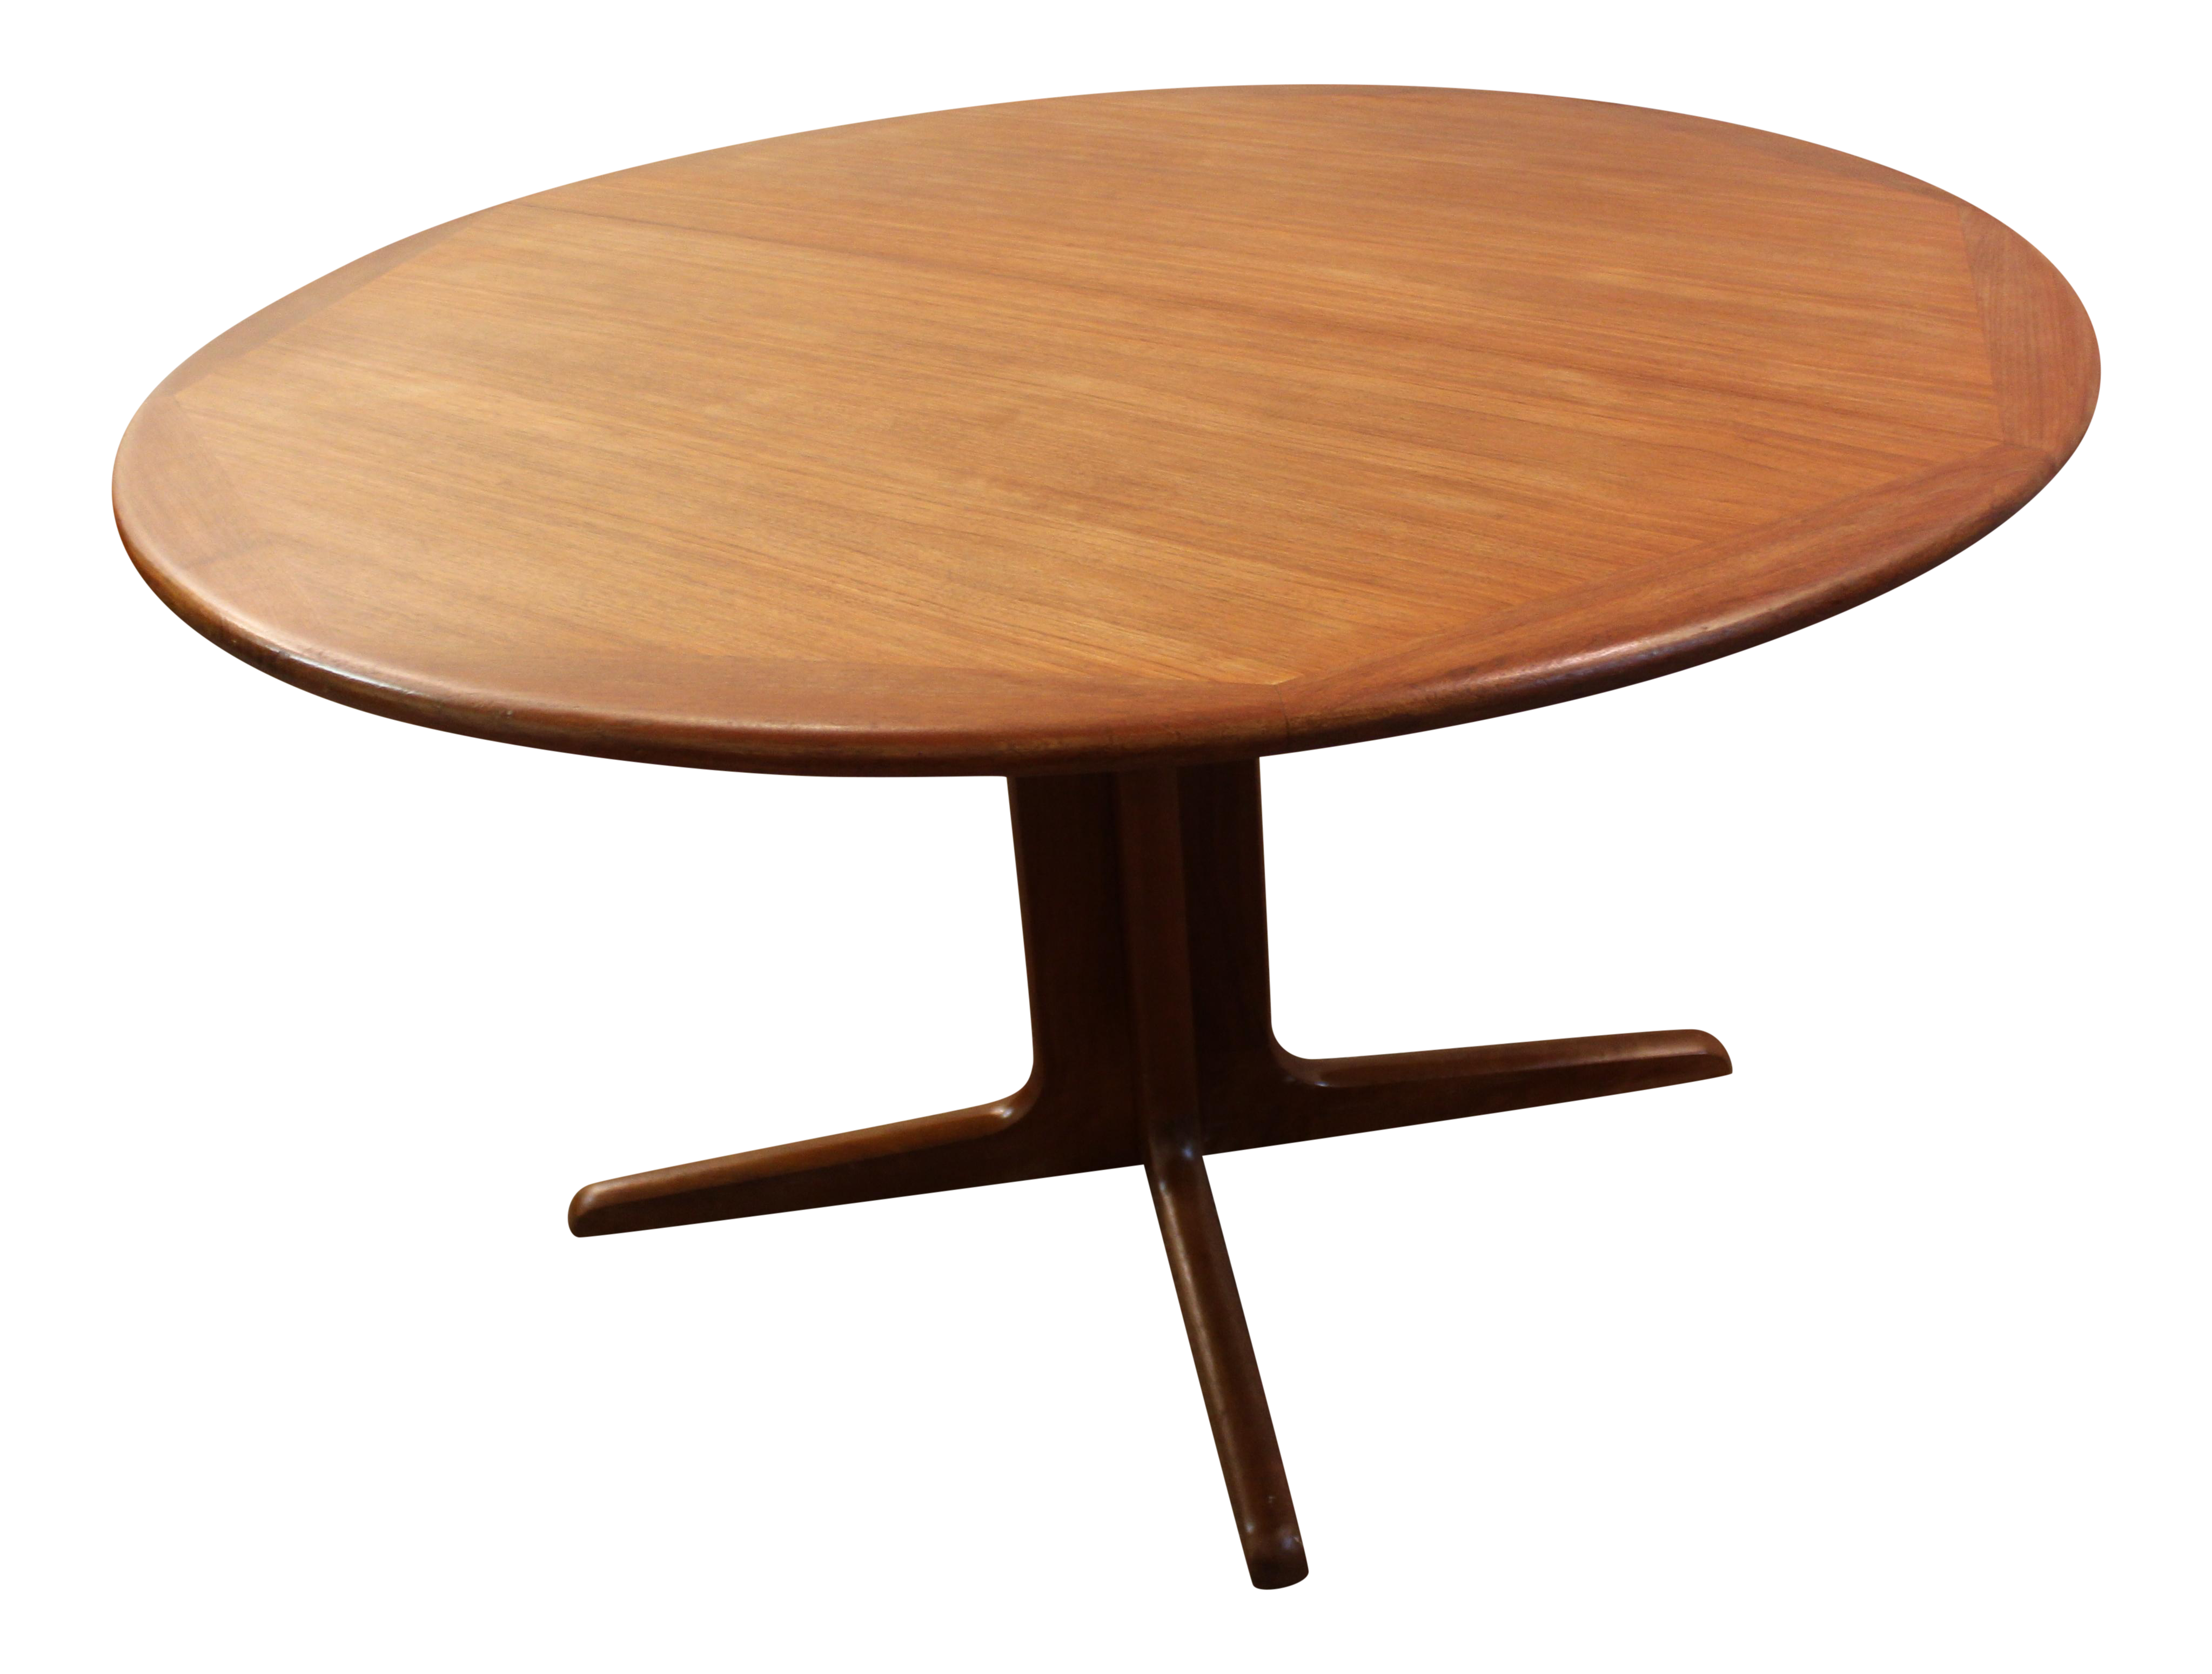 MidCentury Danish Modern Teak Round Dining Table Chairish